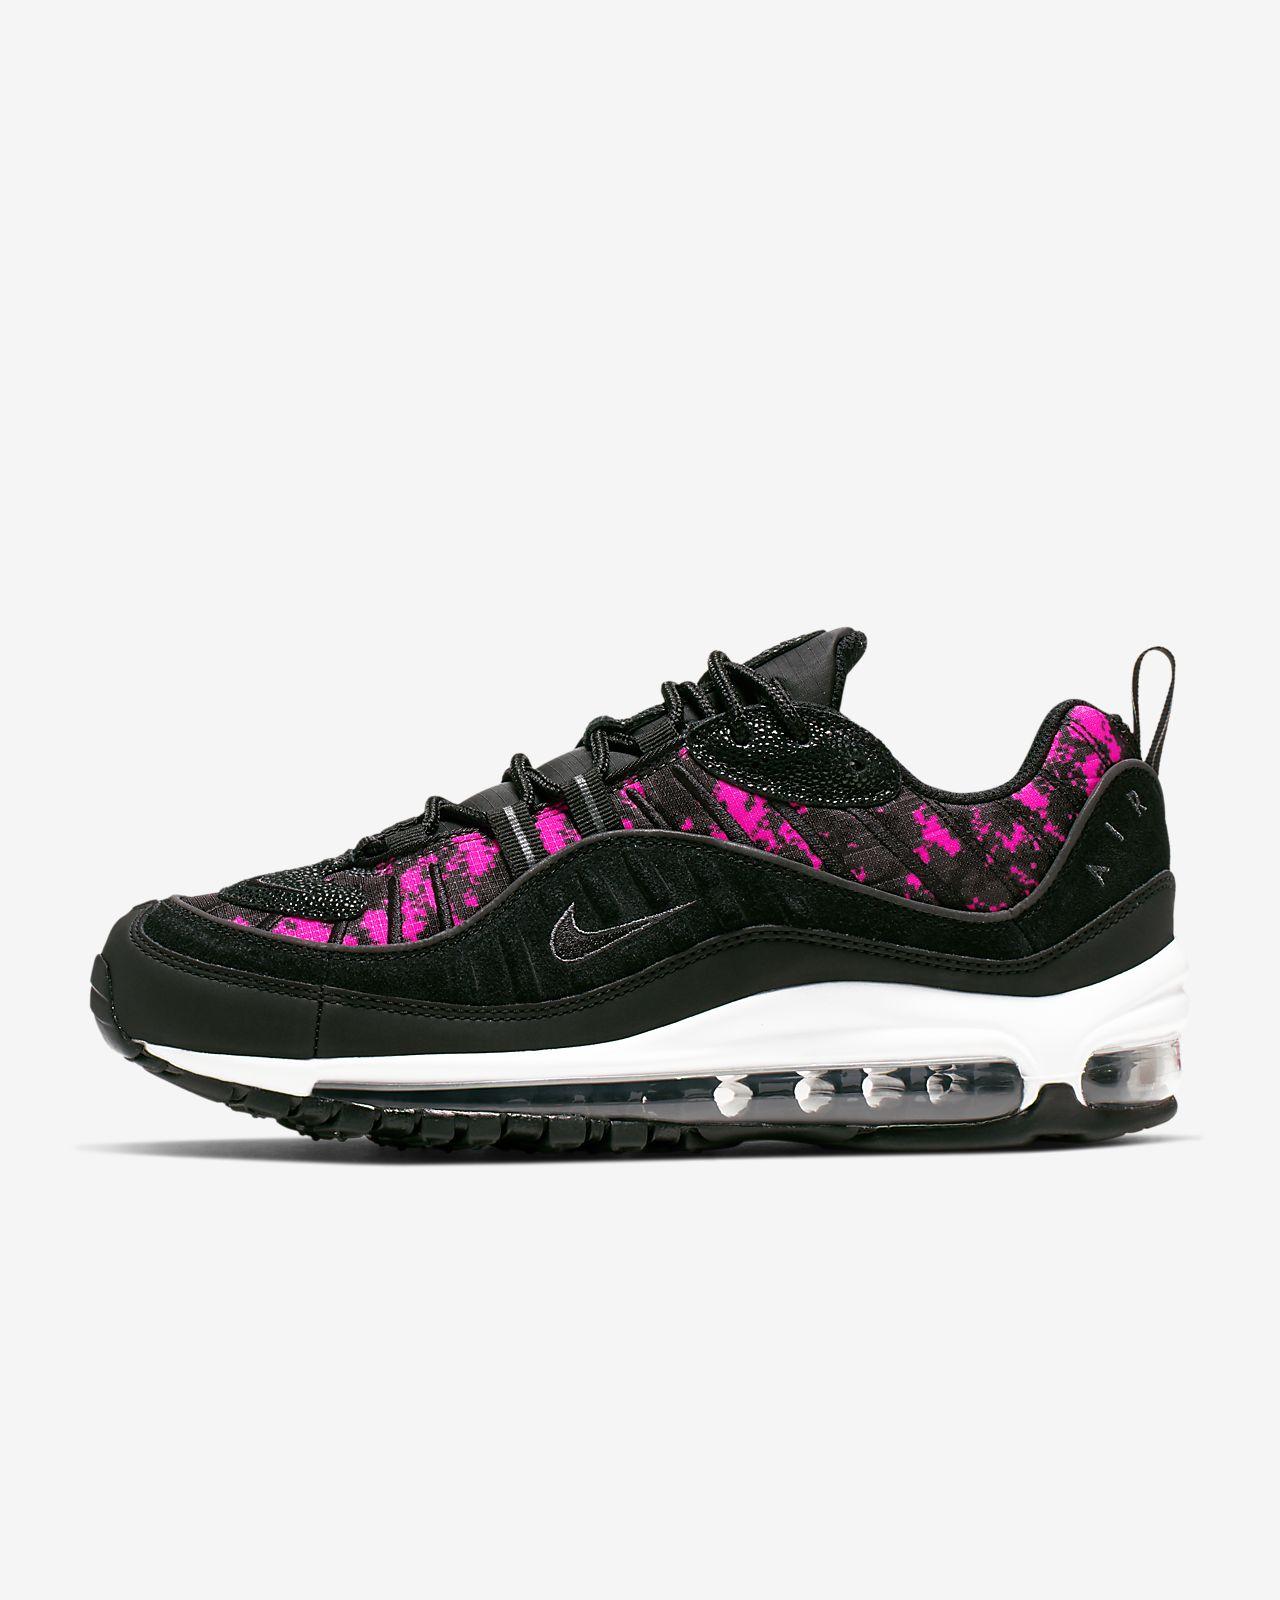 Buty damskie Nike Air Max 98 Premium Camo